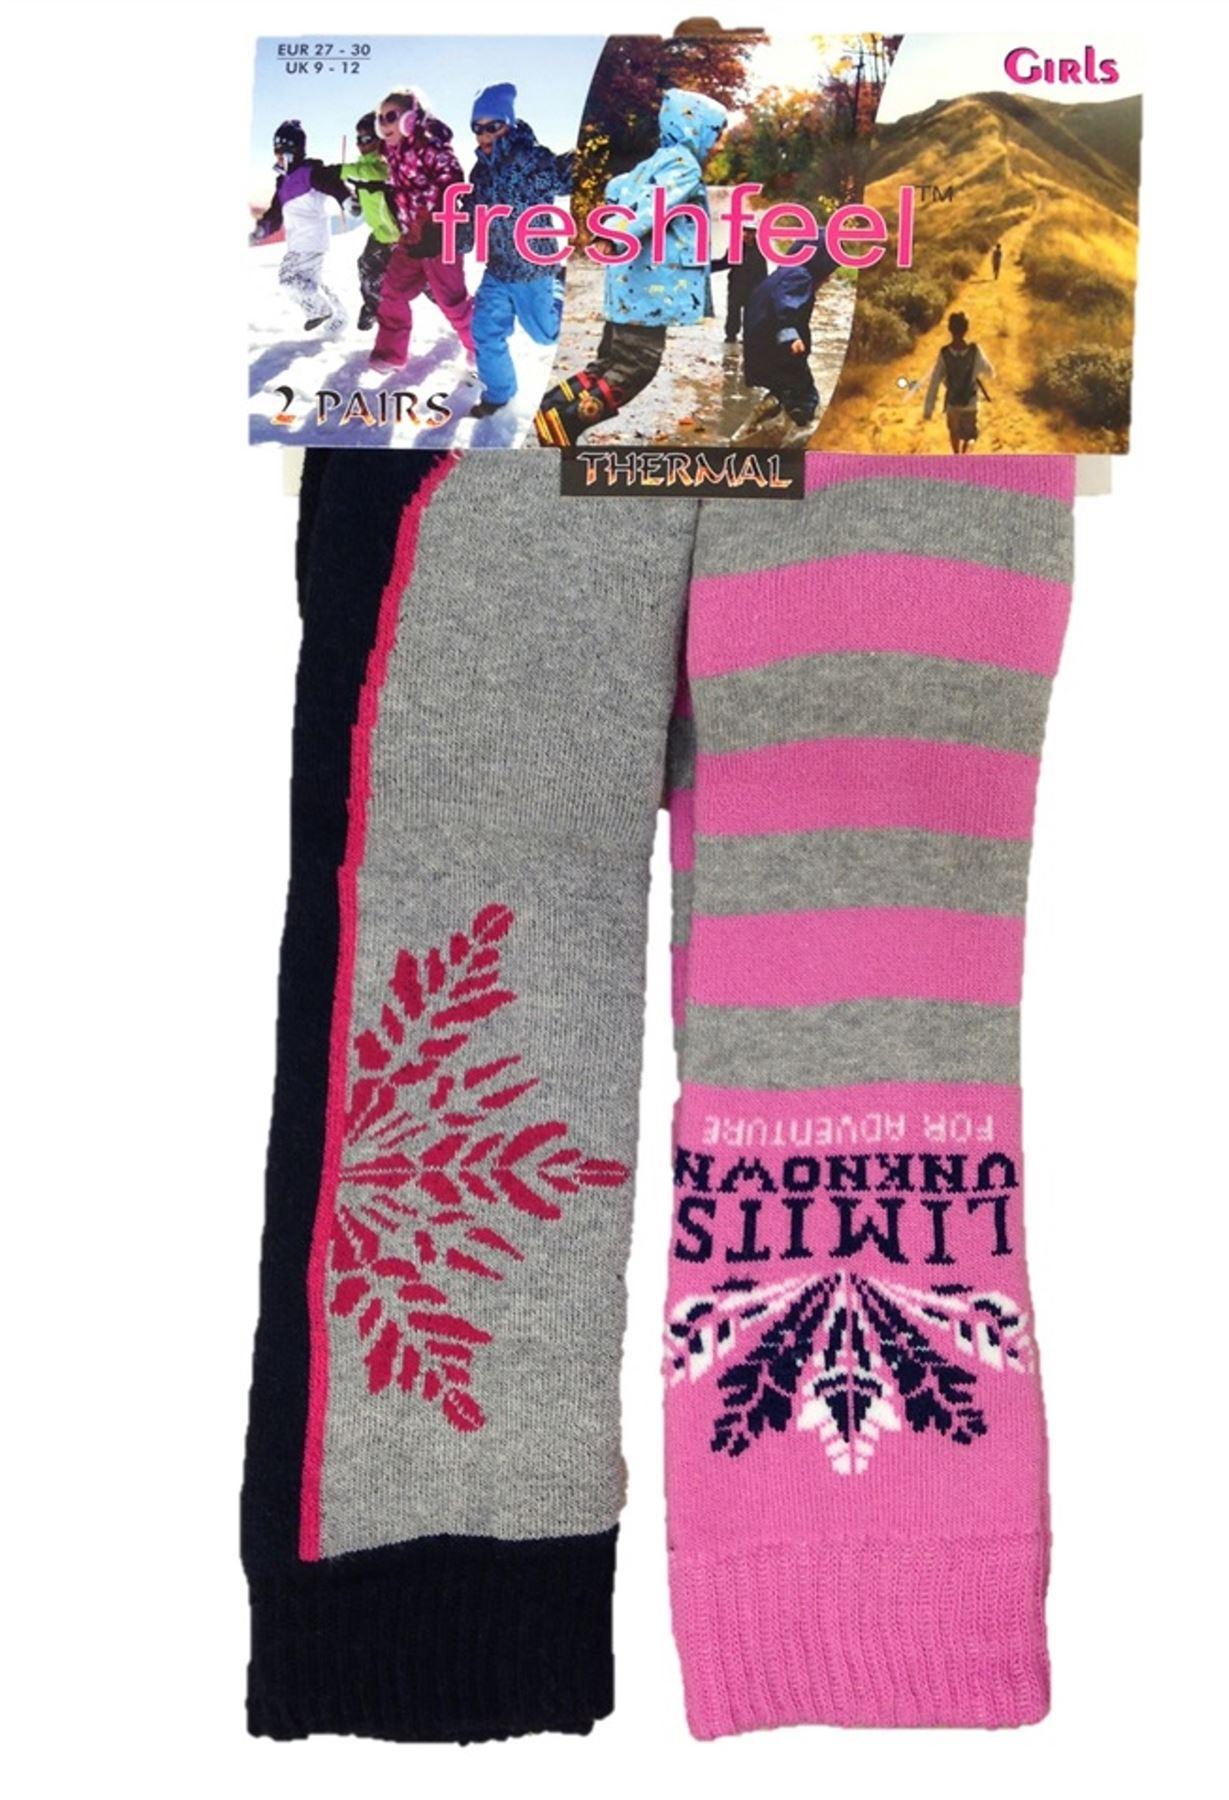 ddd6f5d73 2 Pairs Fresh Feel Boys Or Girls Childrens Kids Thermal Ski Boot ...